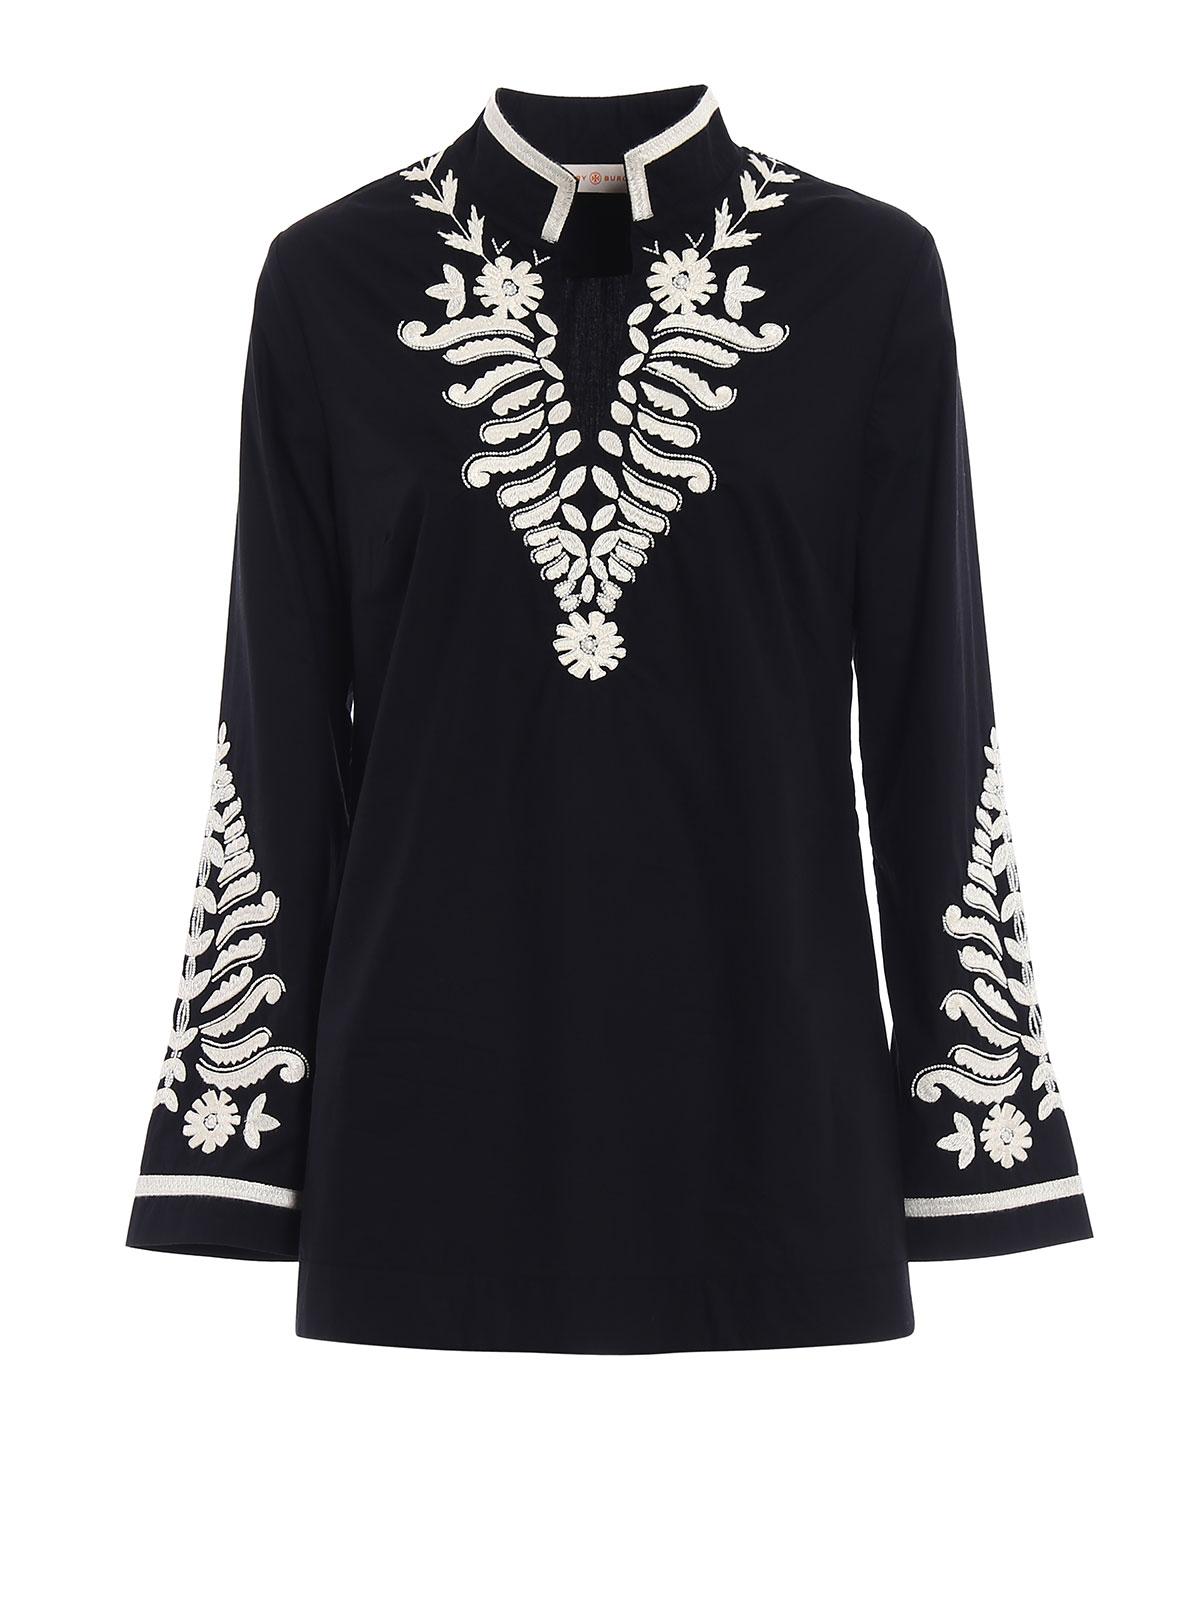 93389db92f Tory Burch - Tory bead and embroidery tunic - tunics - 43769887